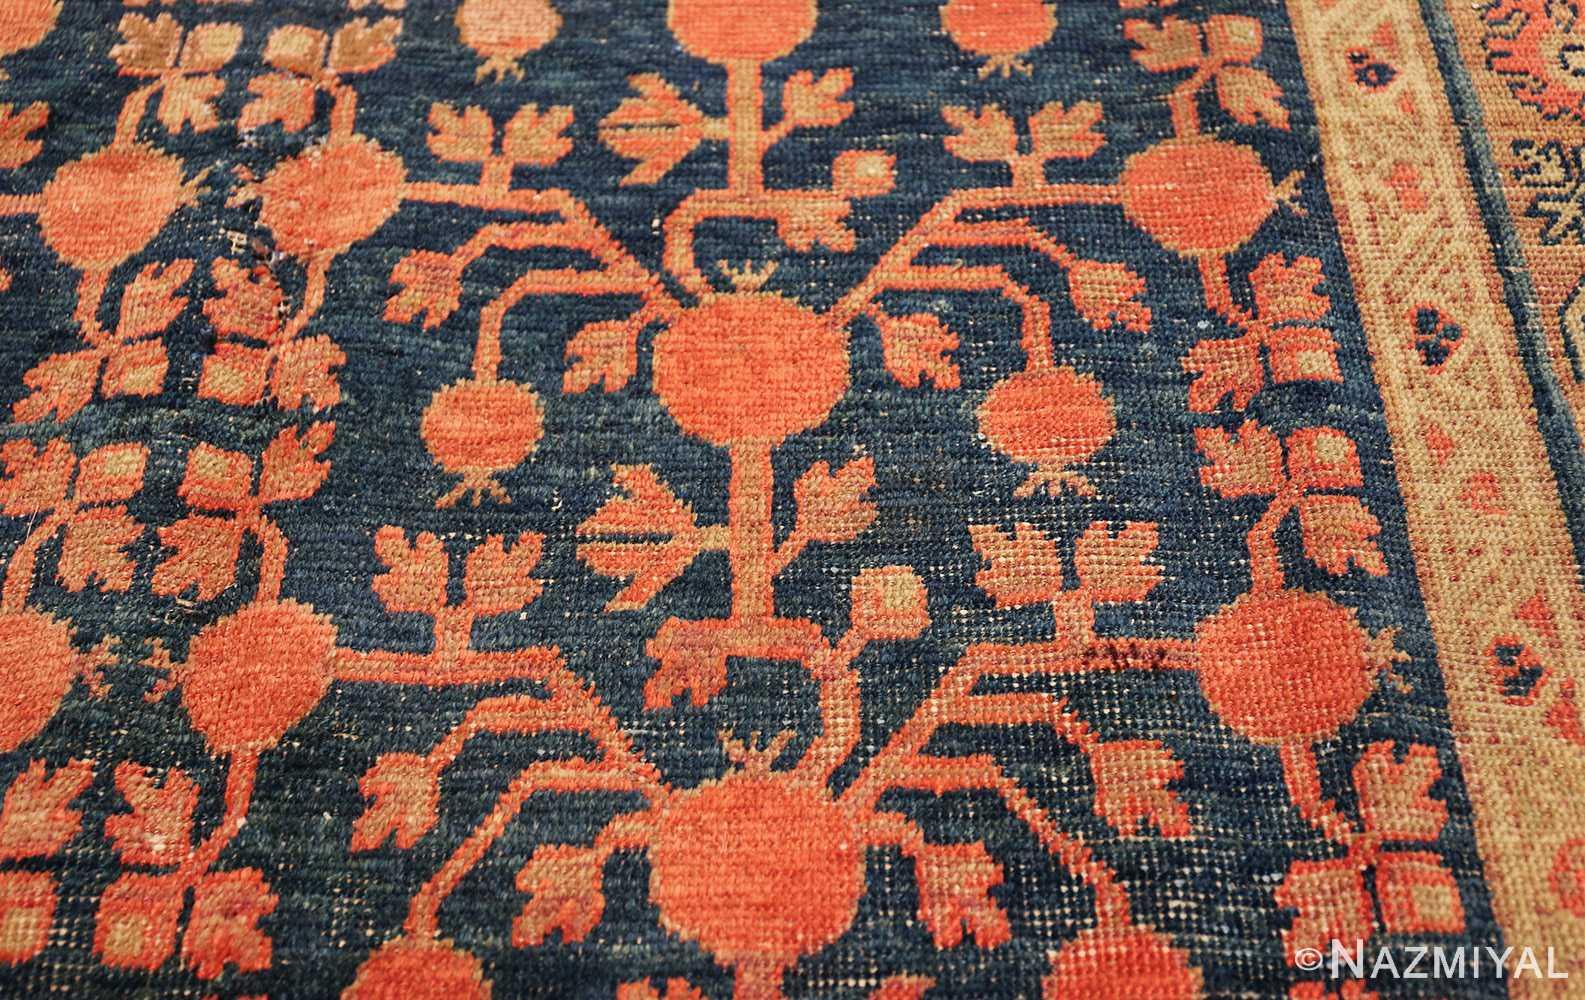 antique navy background pomegranate design khotan rug 49483 pomegranate Nazmiyal